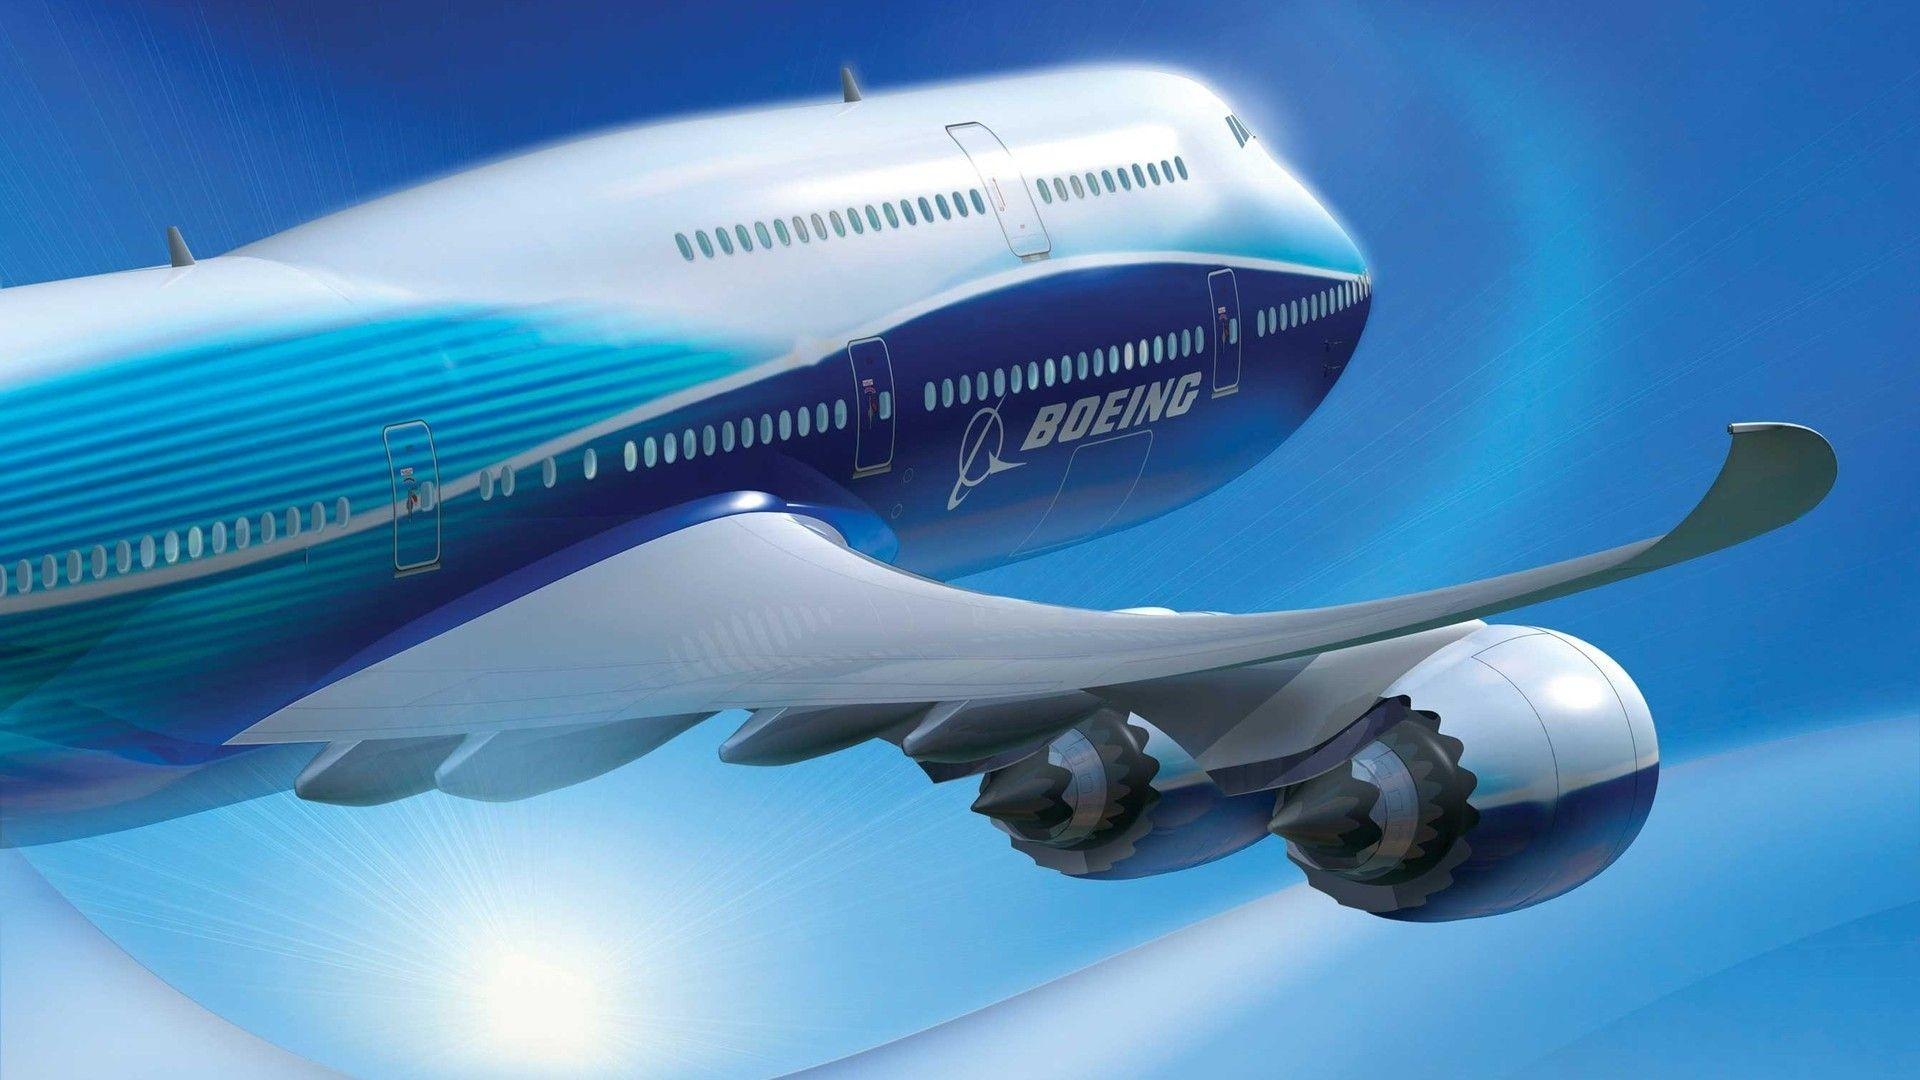 Обои boeing 747. Авиация foto 15